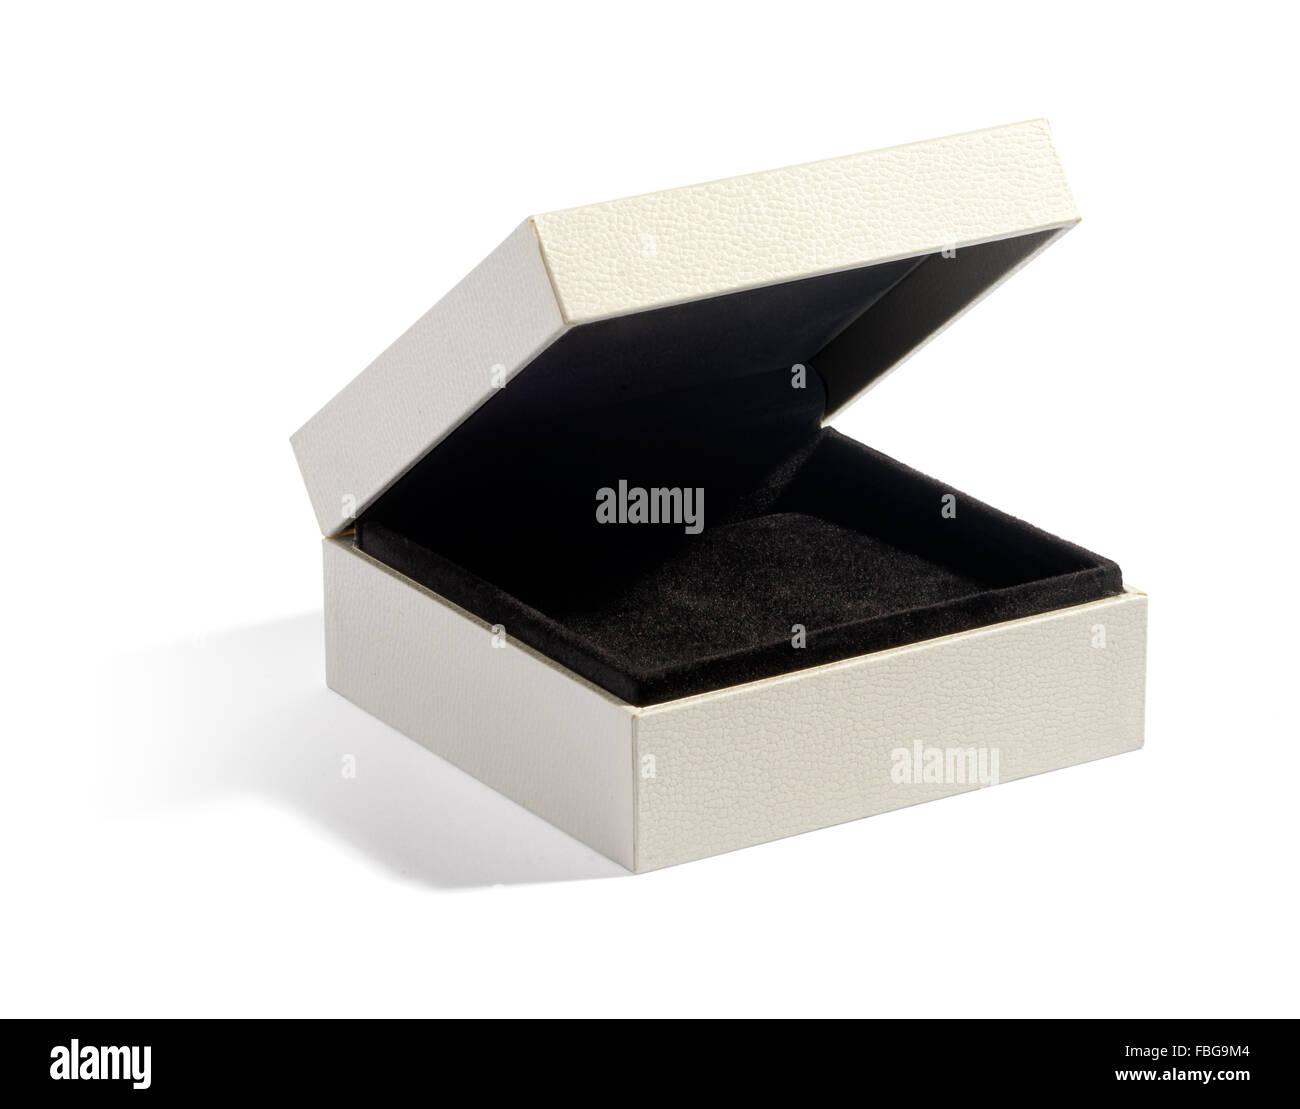 Simple empty half open jewelry box with black felt padding on white background - Stock Image